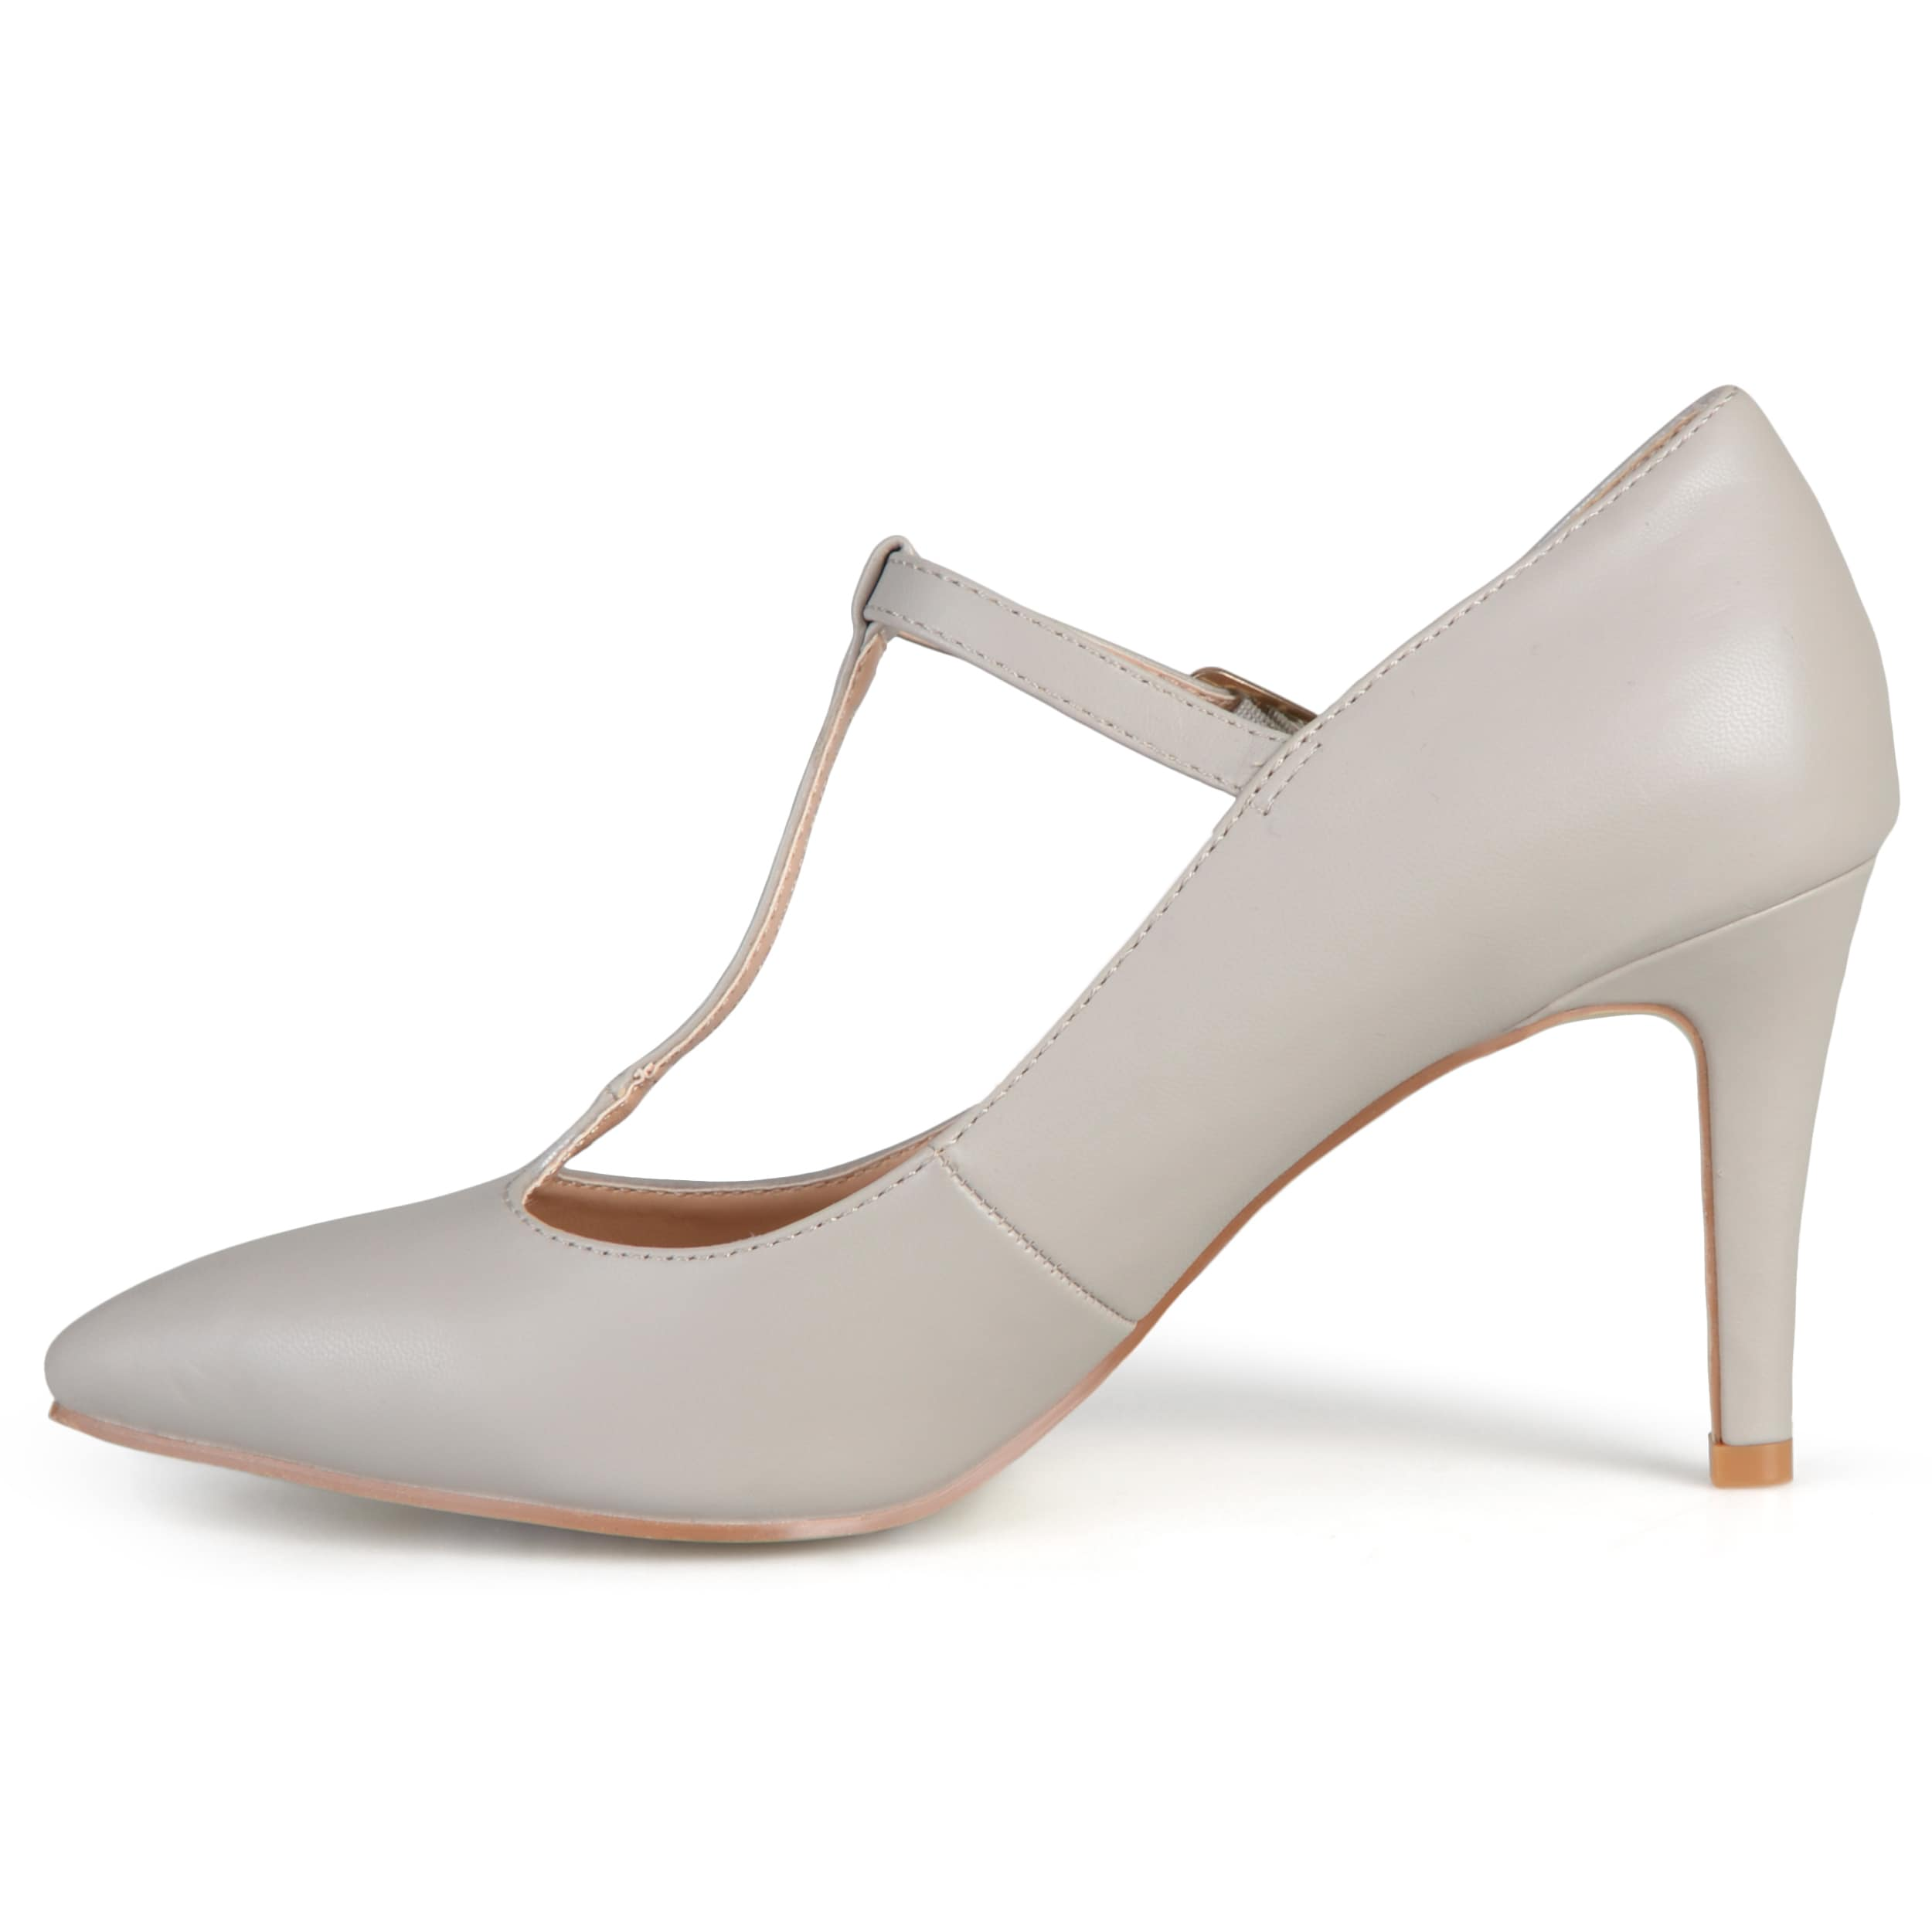 Journee Collection Dream ... Women's High Heels new styles online hHNwjBG